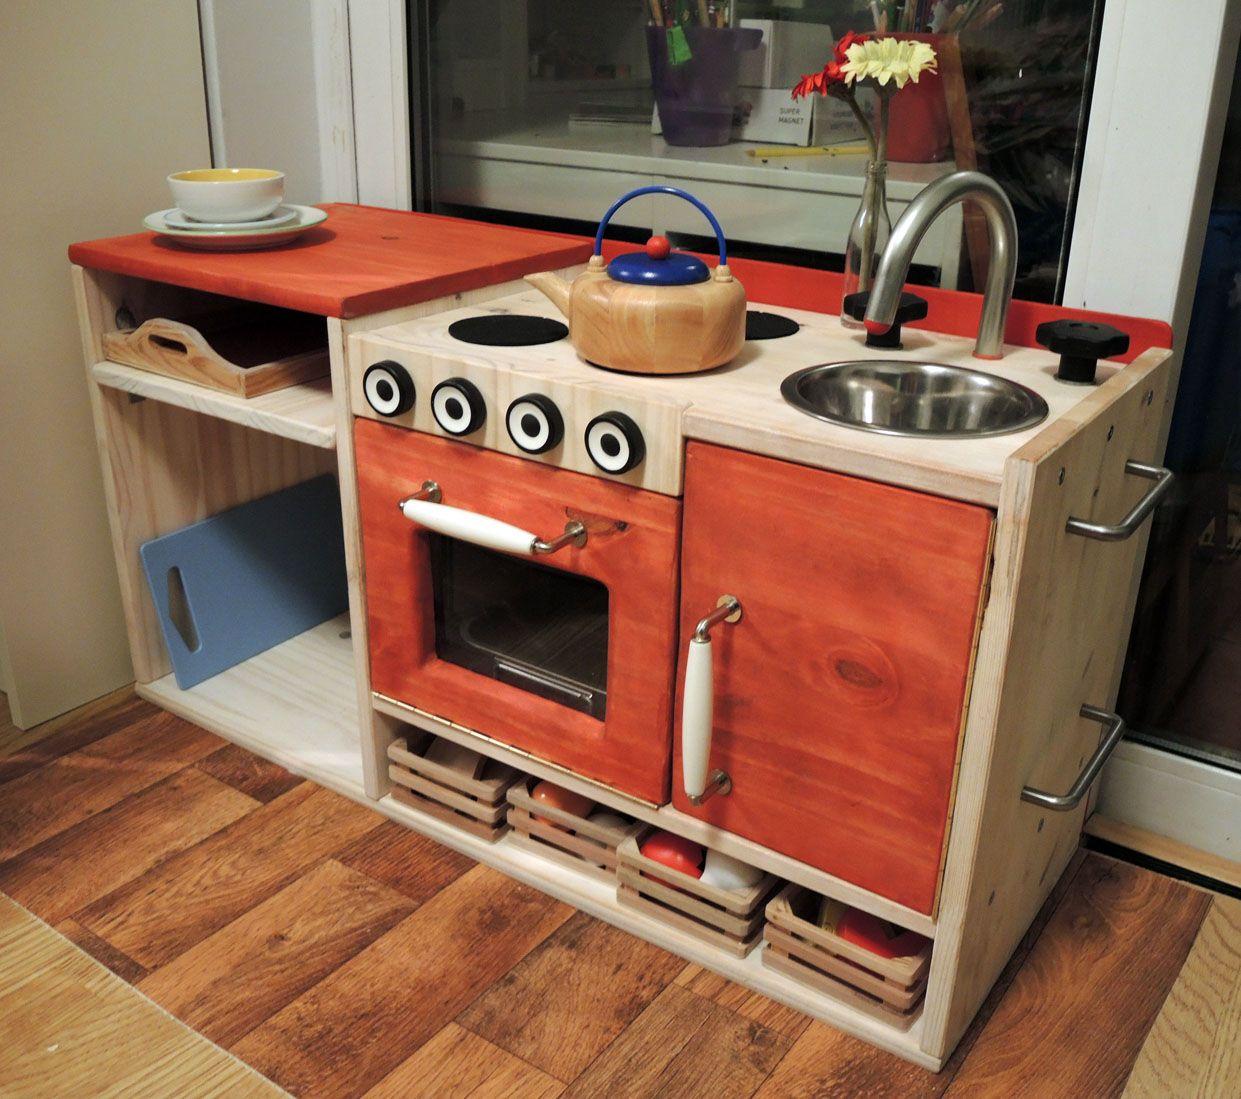 ikea rast diy play kitchen hack crafts pinterest diy play ki